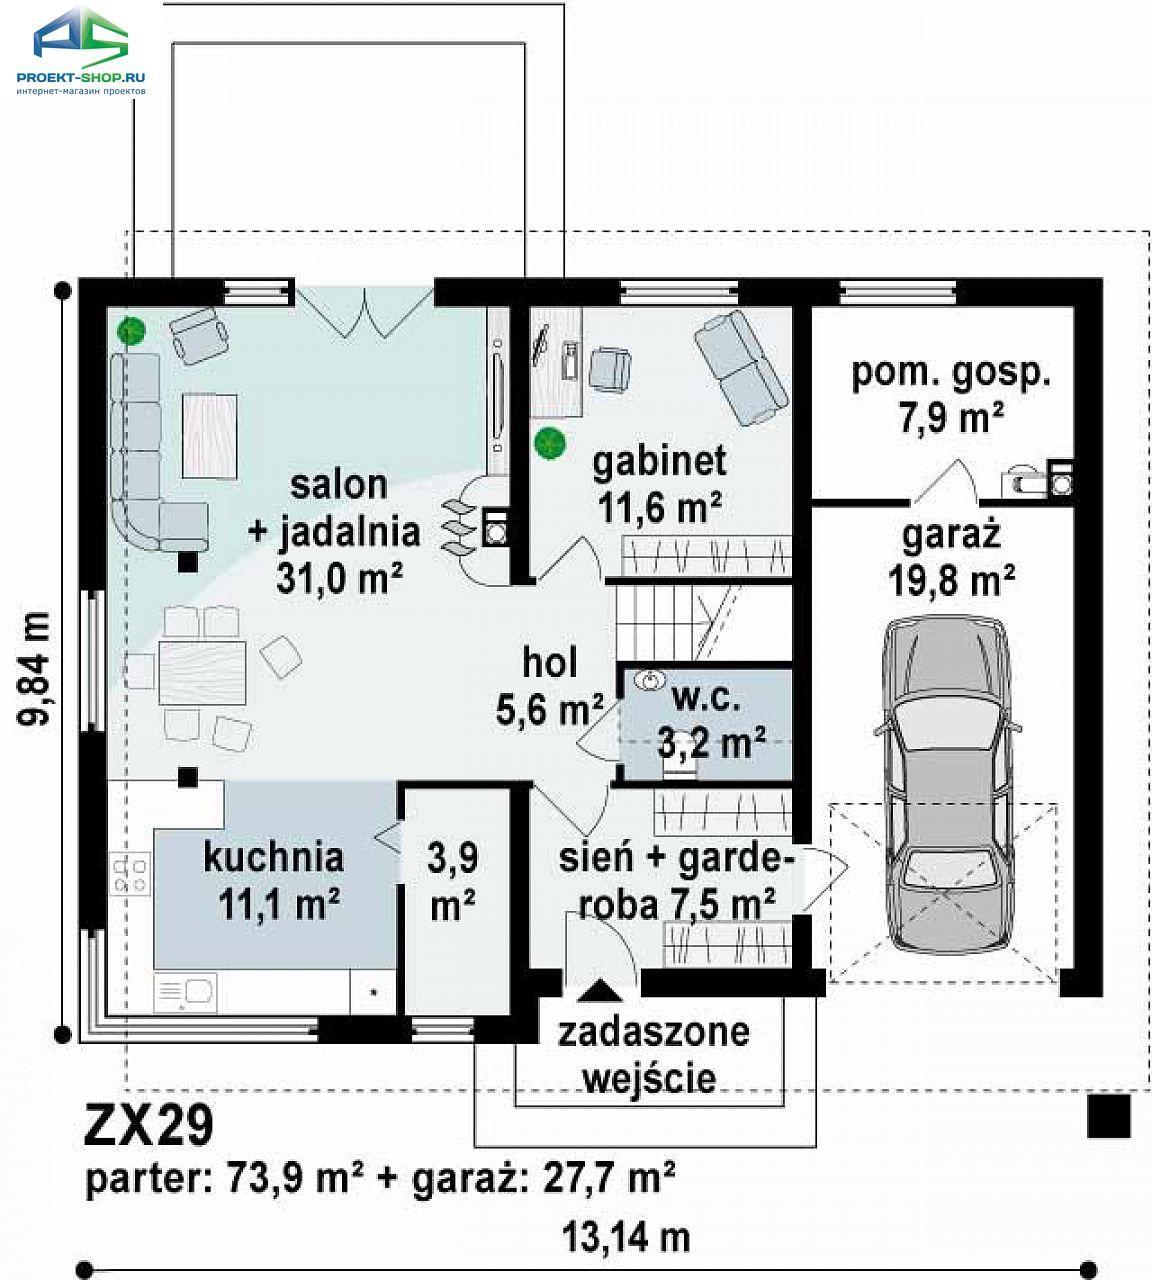 Планировка проекта zx29